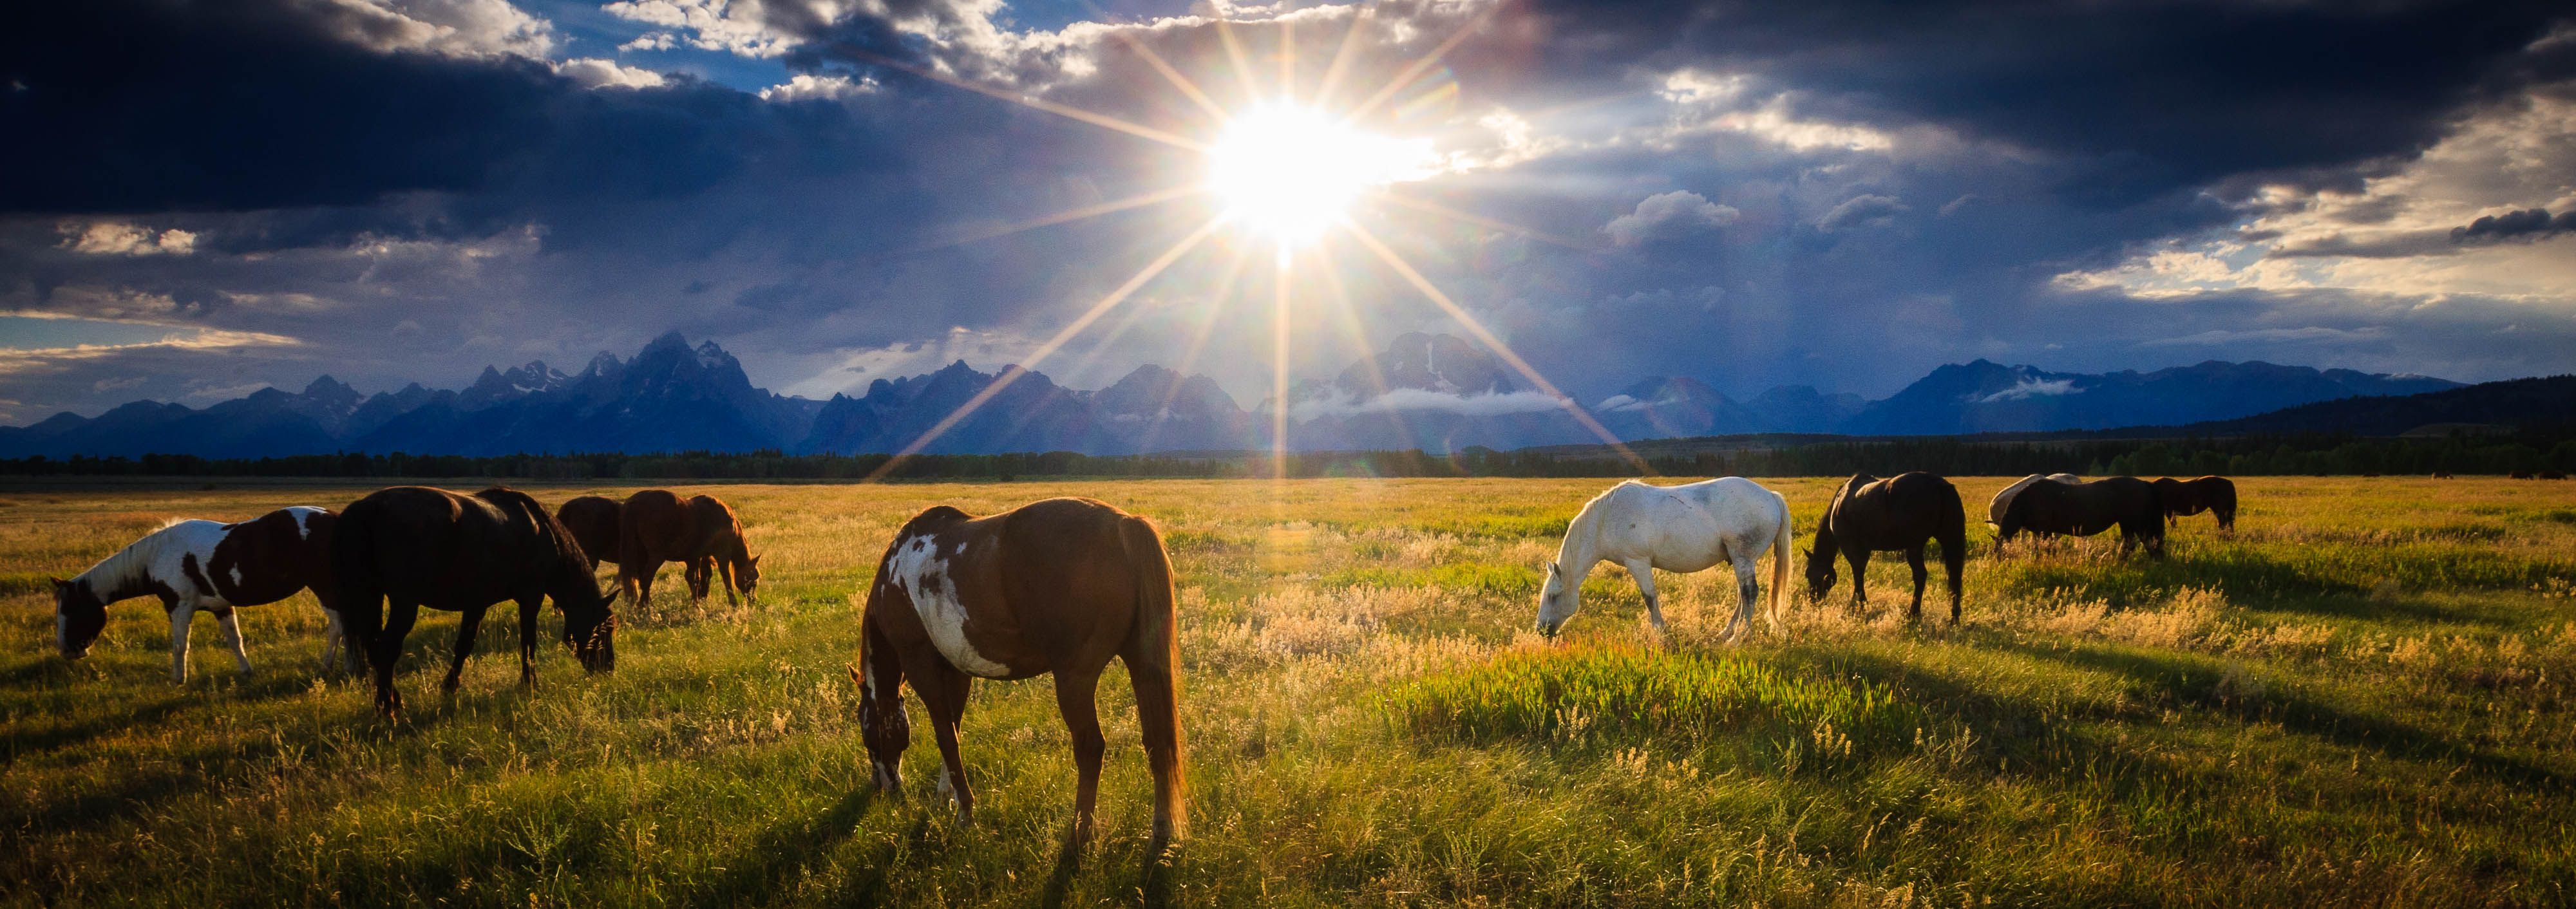 teton sunset horses limited-edition print by Jay Goodrich